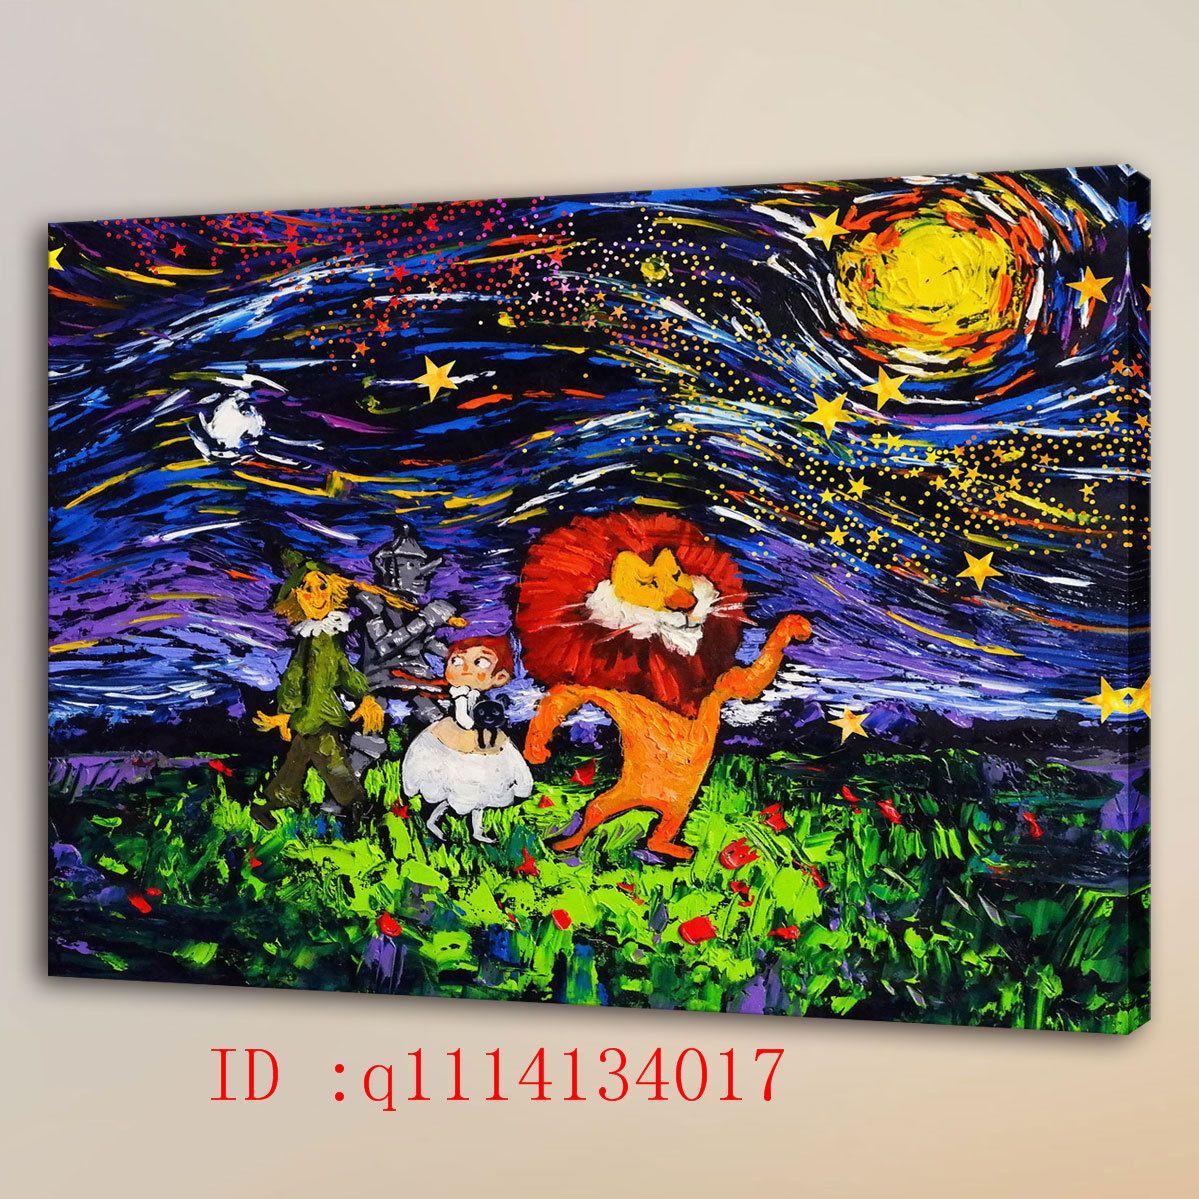 2018 Van Gogh The Wizard Of Oz Hd Canvas Prints Wall Art Oil ...